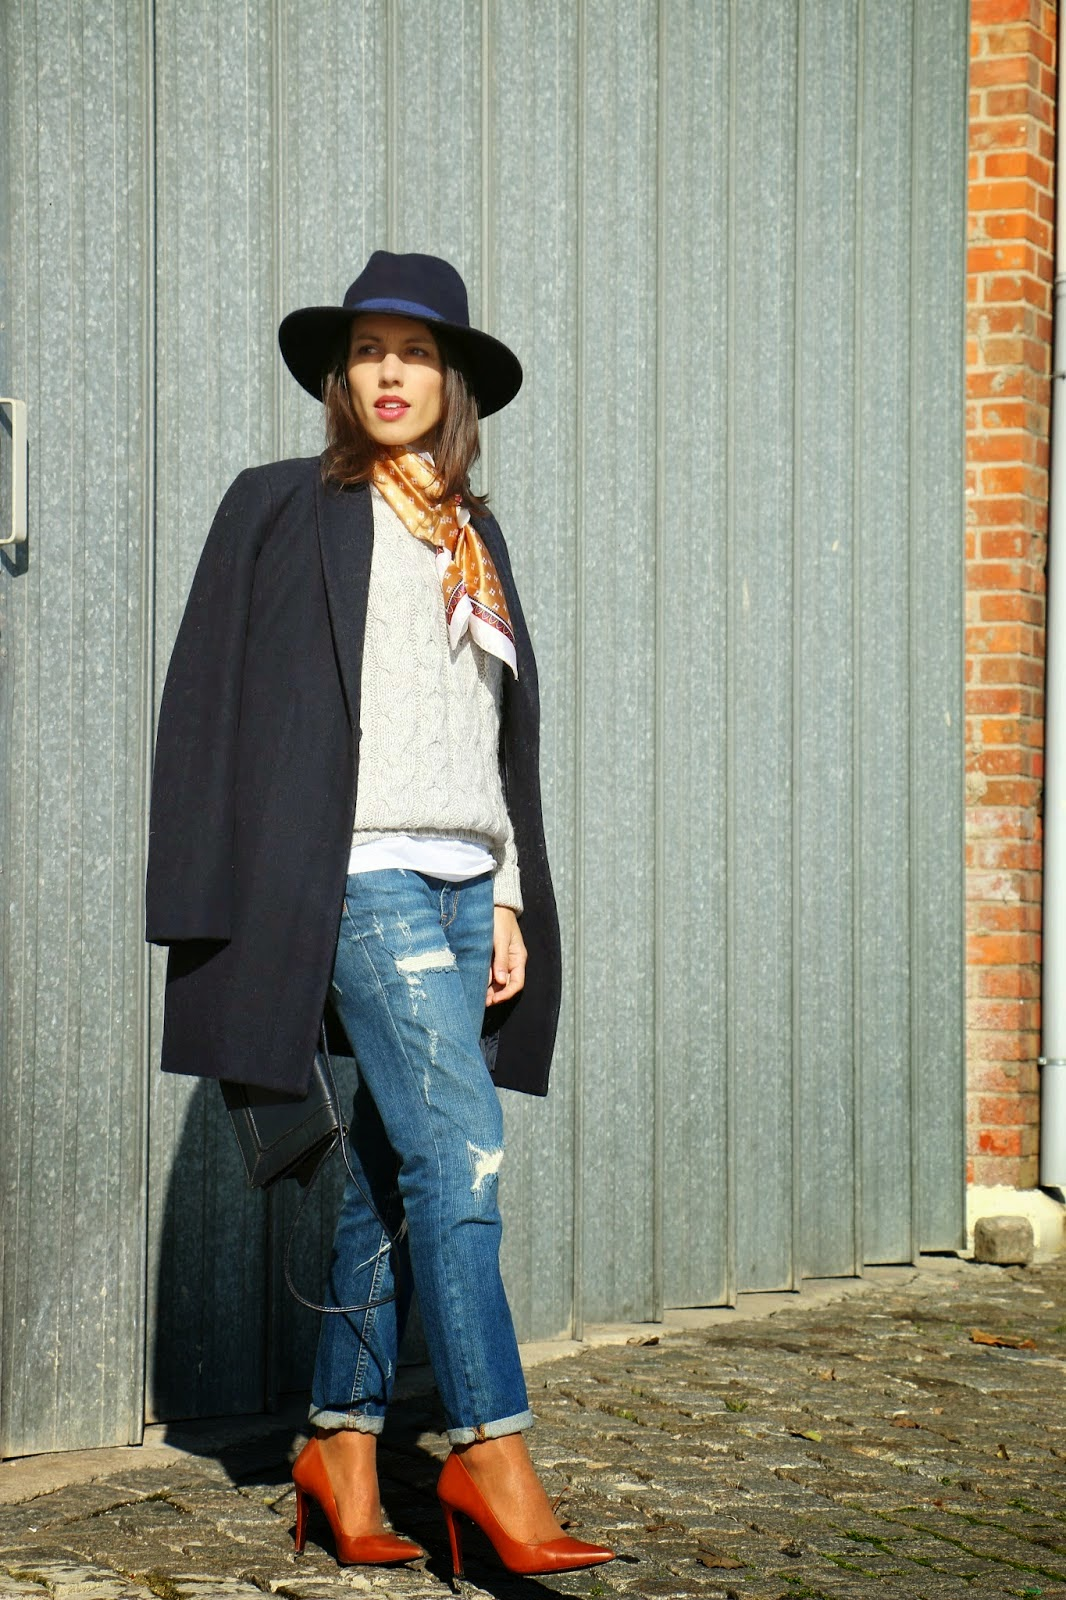 http://ilovefitametrica.blogspot.pt/2014/12/silk-scarf.html?showComment=1417733713409#c6082569331101165954